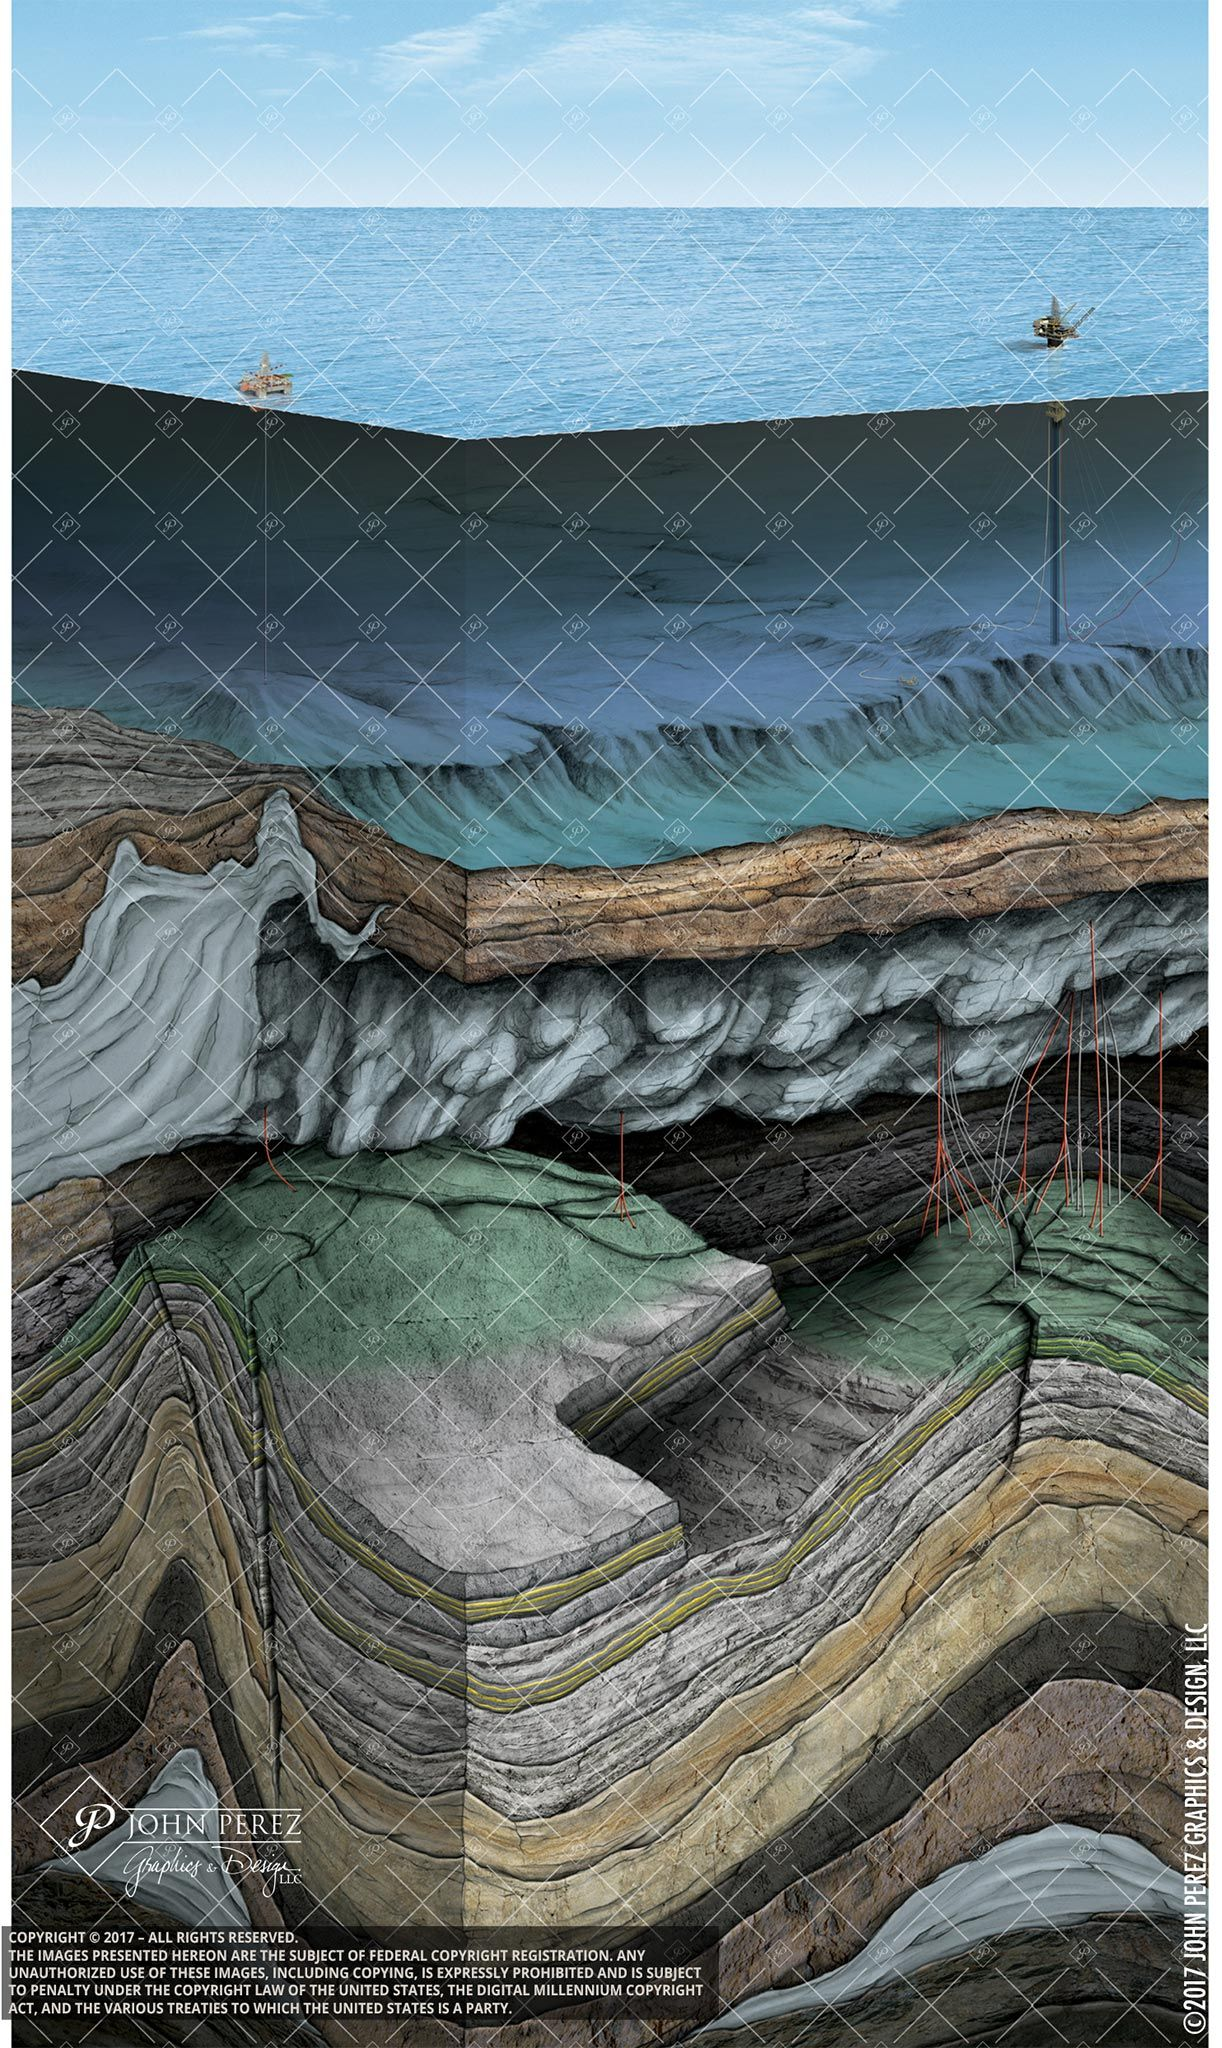 Offshore Drilling Fault Oil Gas Illustration John Perez